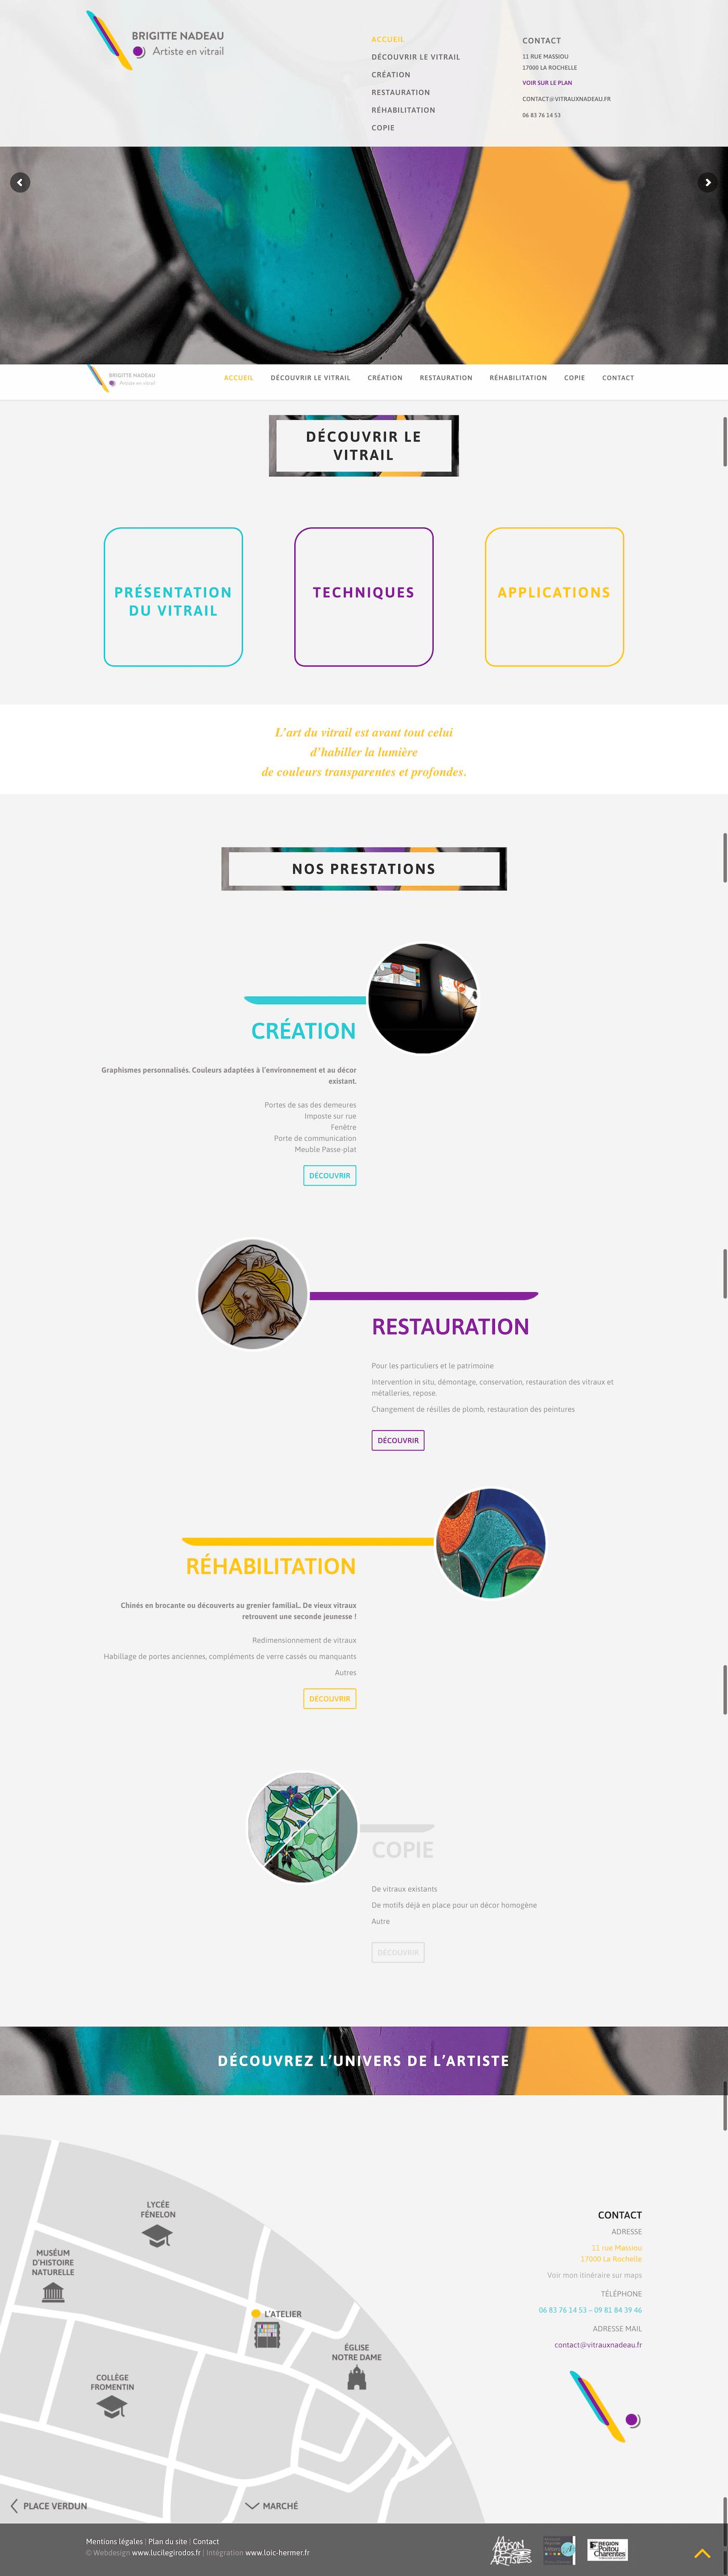 Création Webdesign Roanne Bordeaux loic hermer Graphiste Webdesigner